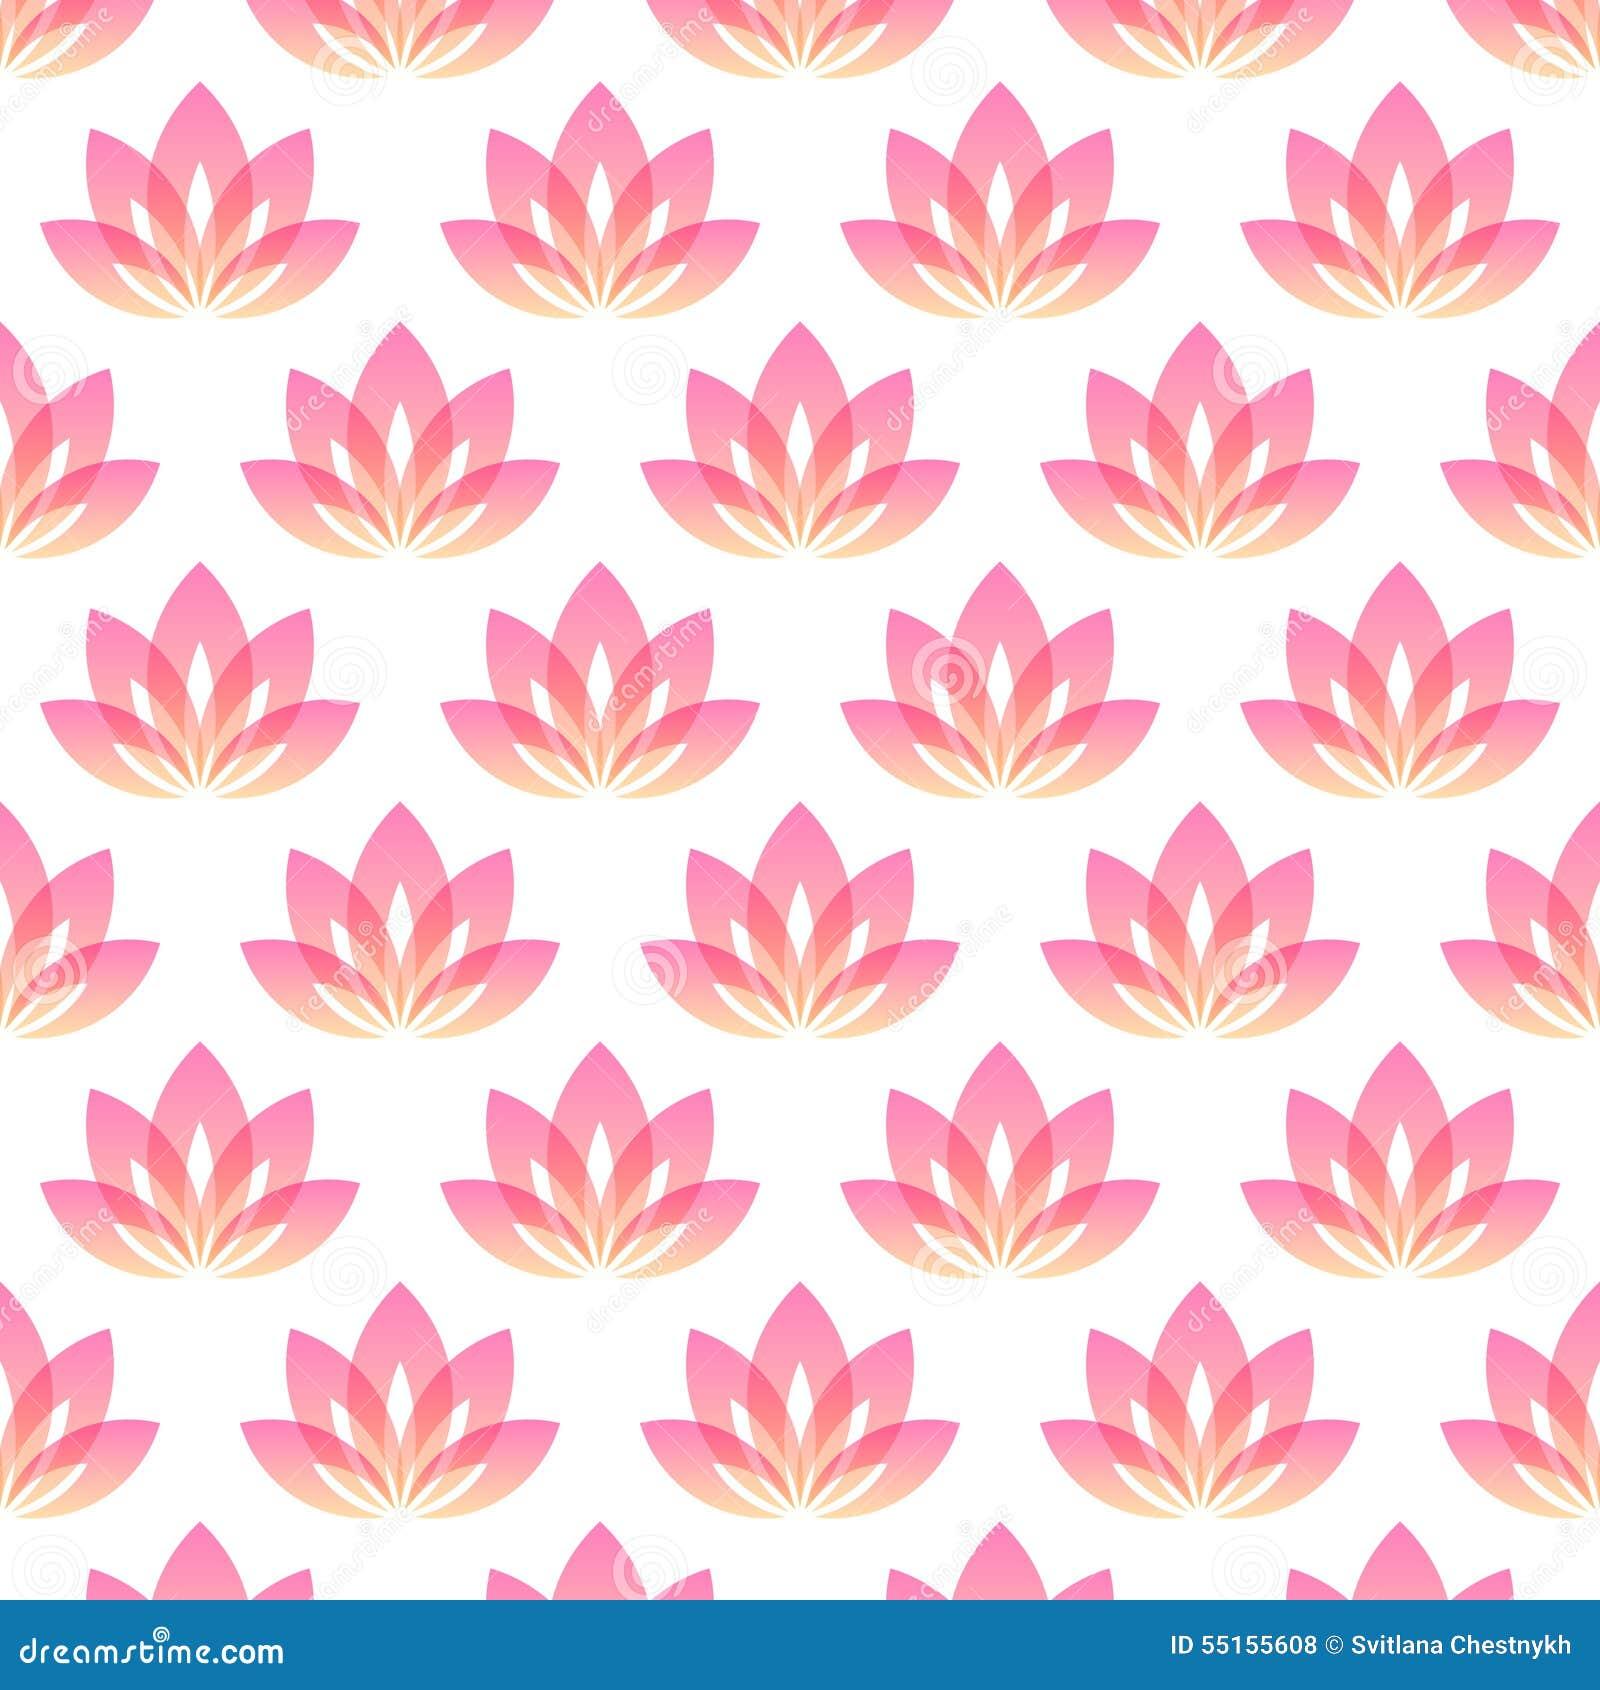 Lotus Flower As Symbol Of Yoga Stock Vector Illustration Of Design